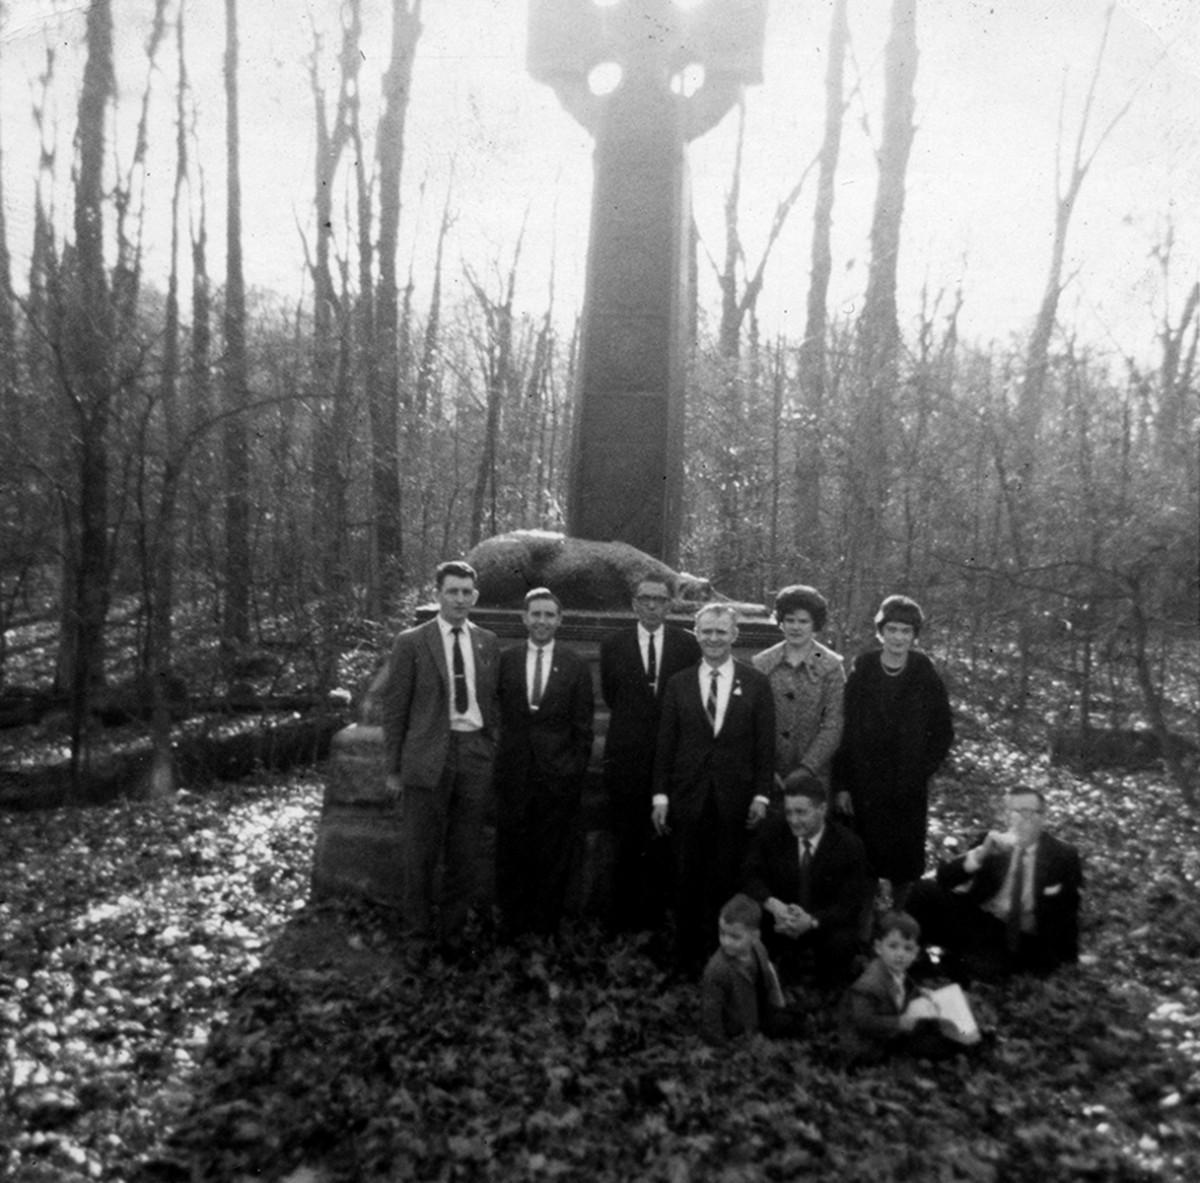 Conlon // County Monaghan :: Visit to the Gettysburg Memorial for the Irish Brigade